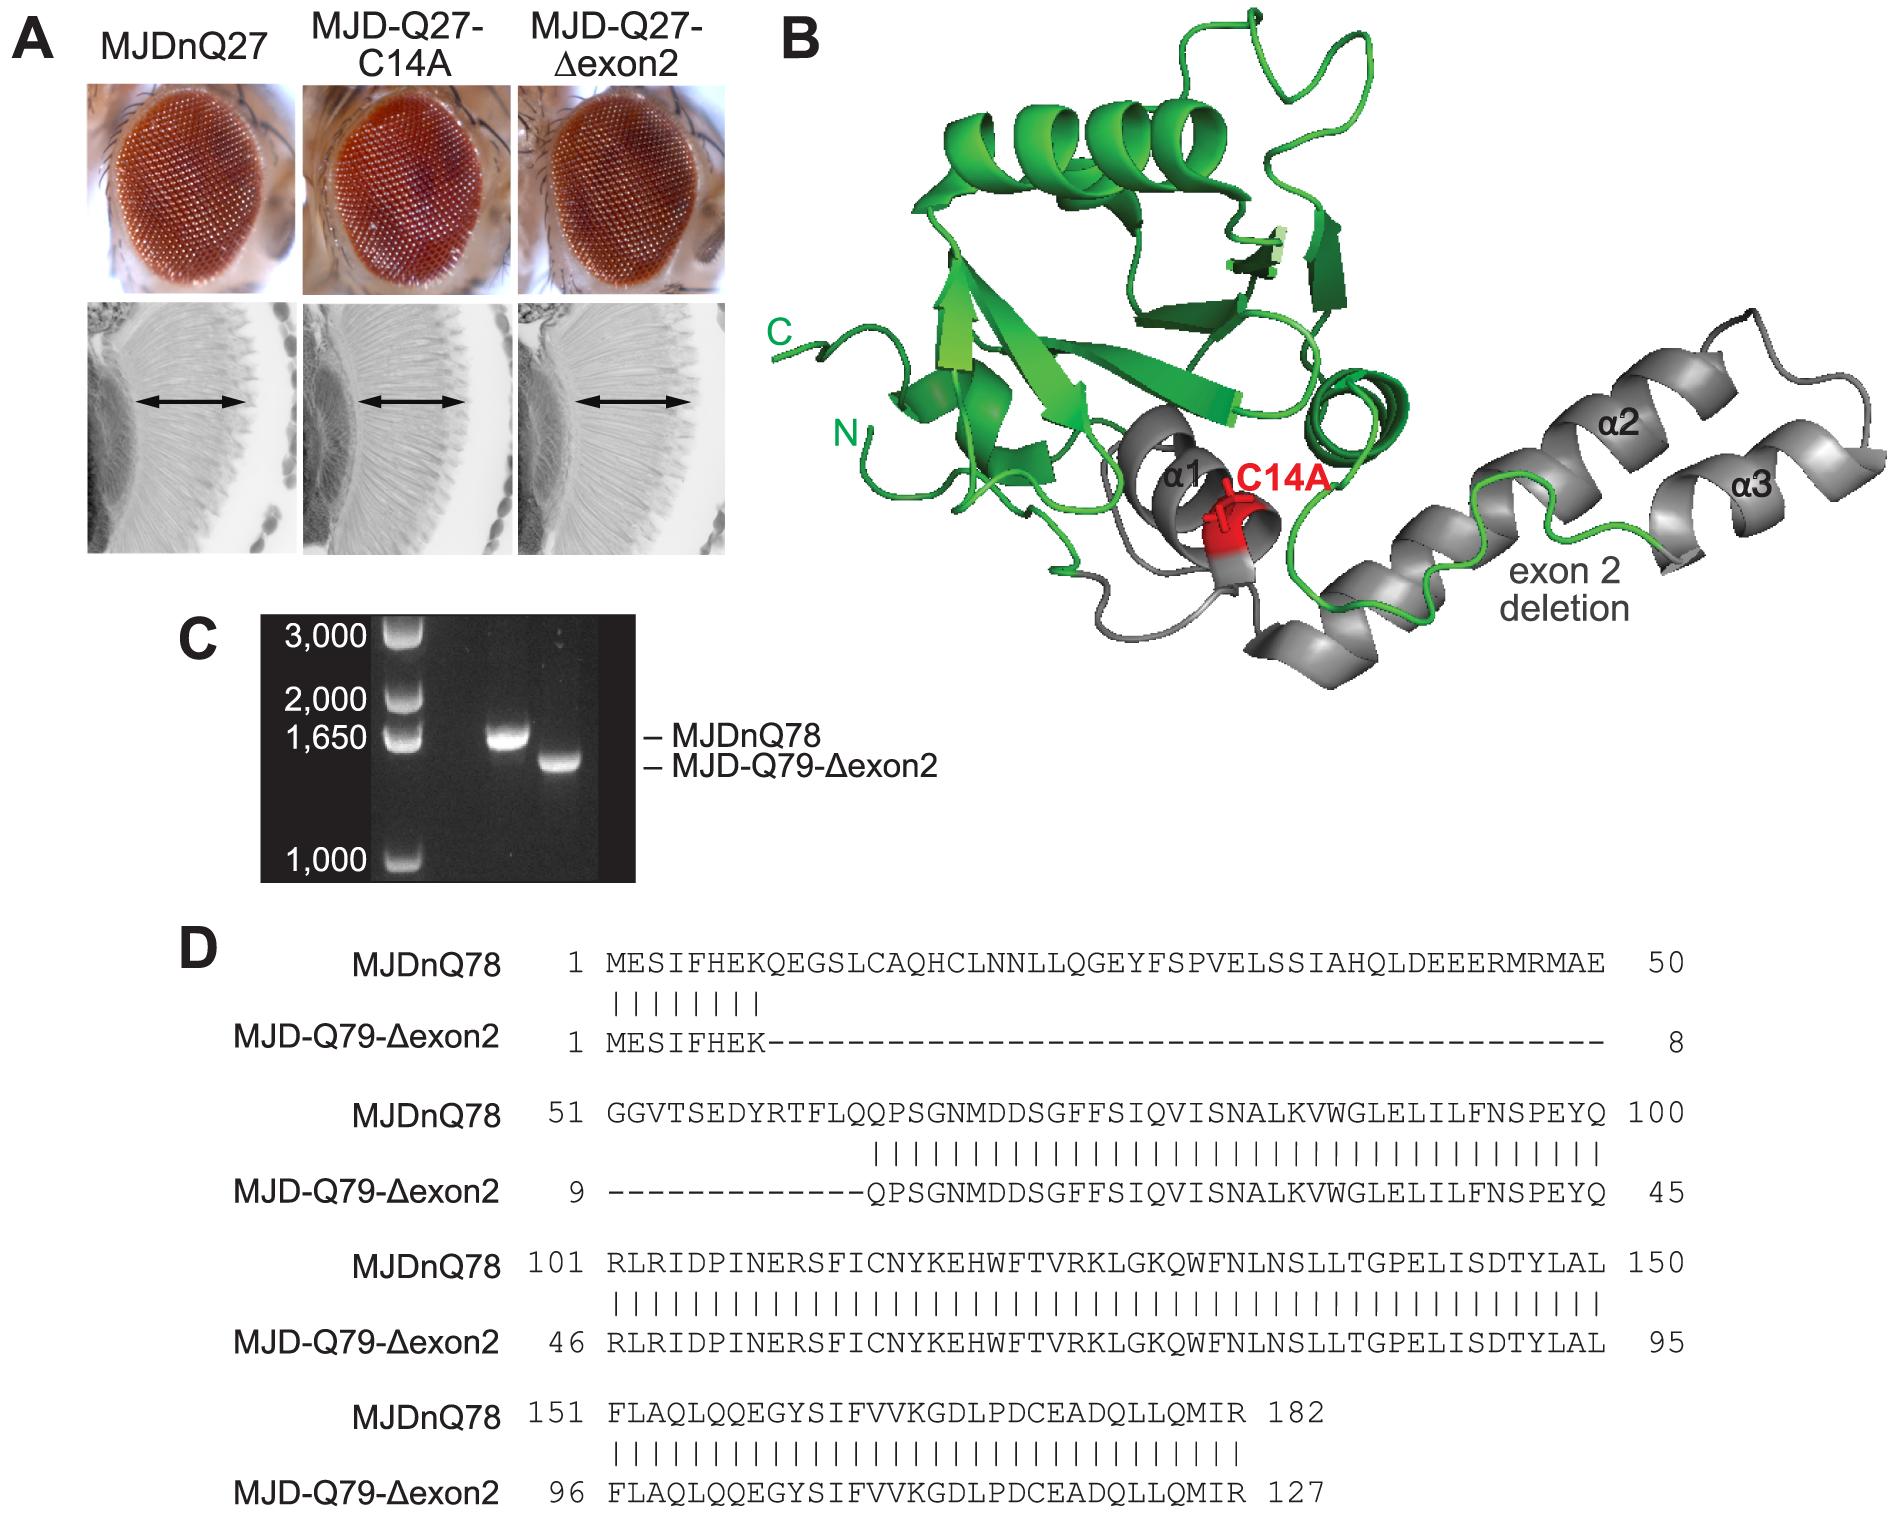 Characterization of DUB-deficient MJD variants.